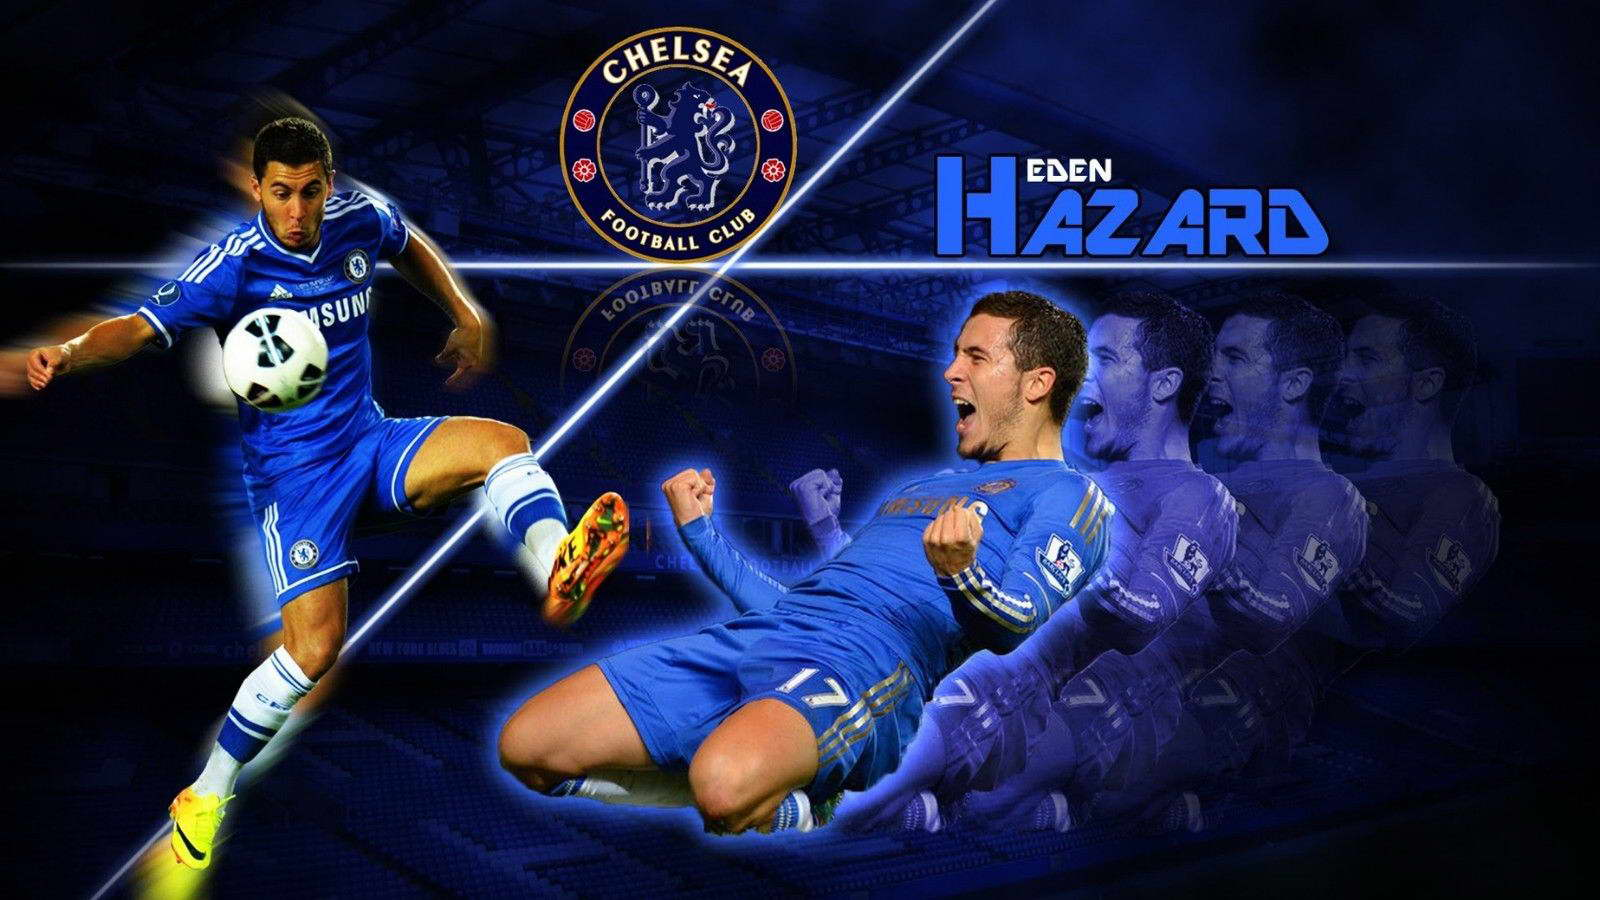 18629 Eden Hazard Football Soccer Star Wall Print POSTER AU